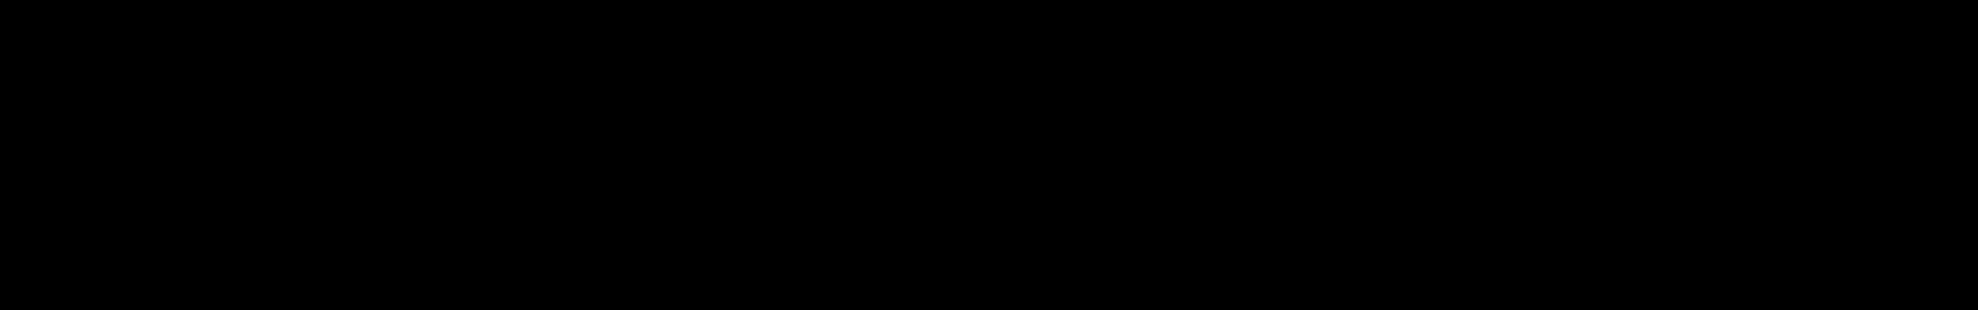 Image-Shr-leo-2